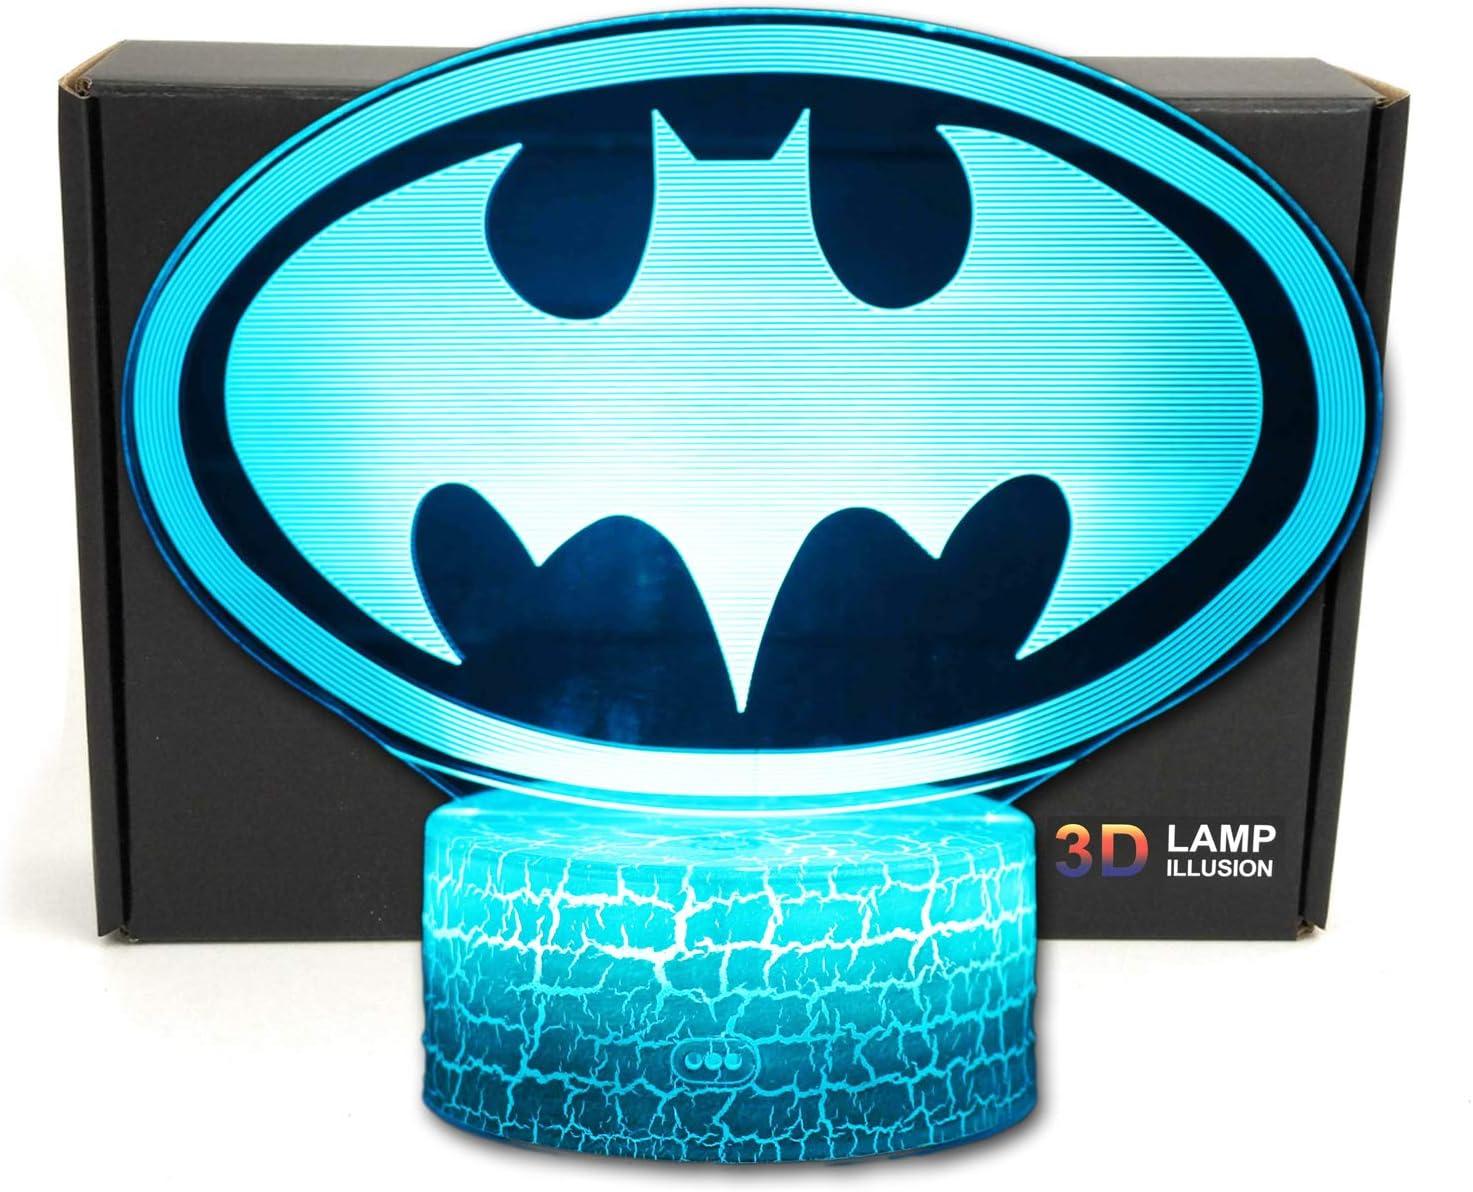 Bat Superhero 3D Illusion Bedroom Night Light Desk Lamp Gift for Batman Fans,Men, Girls, Boys, Teens, Kids, Boyfriends